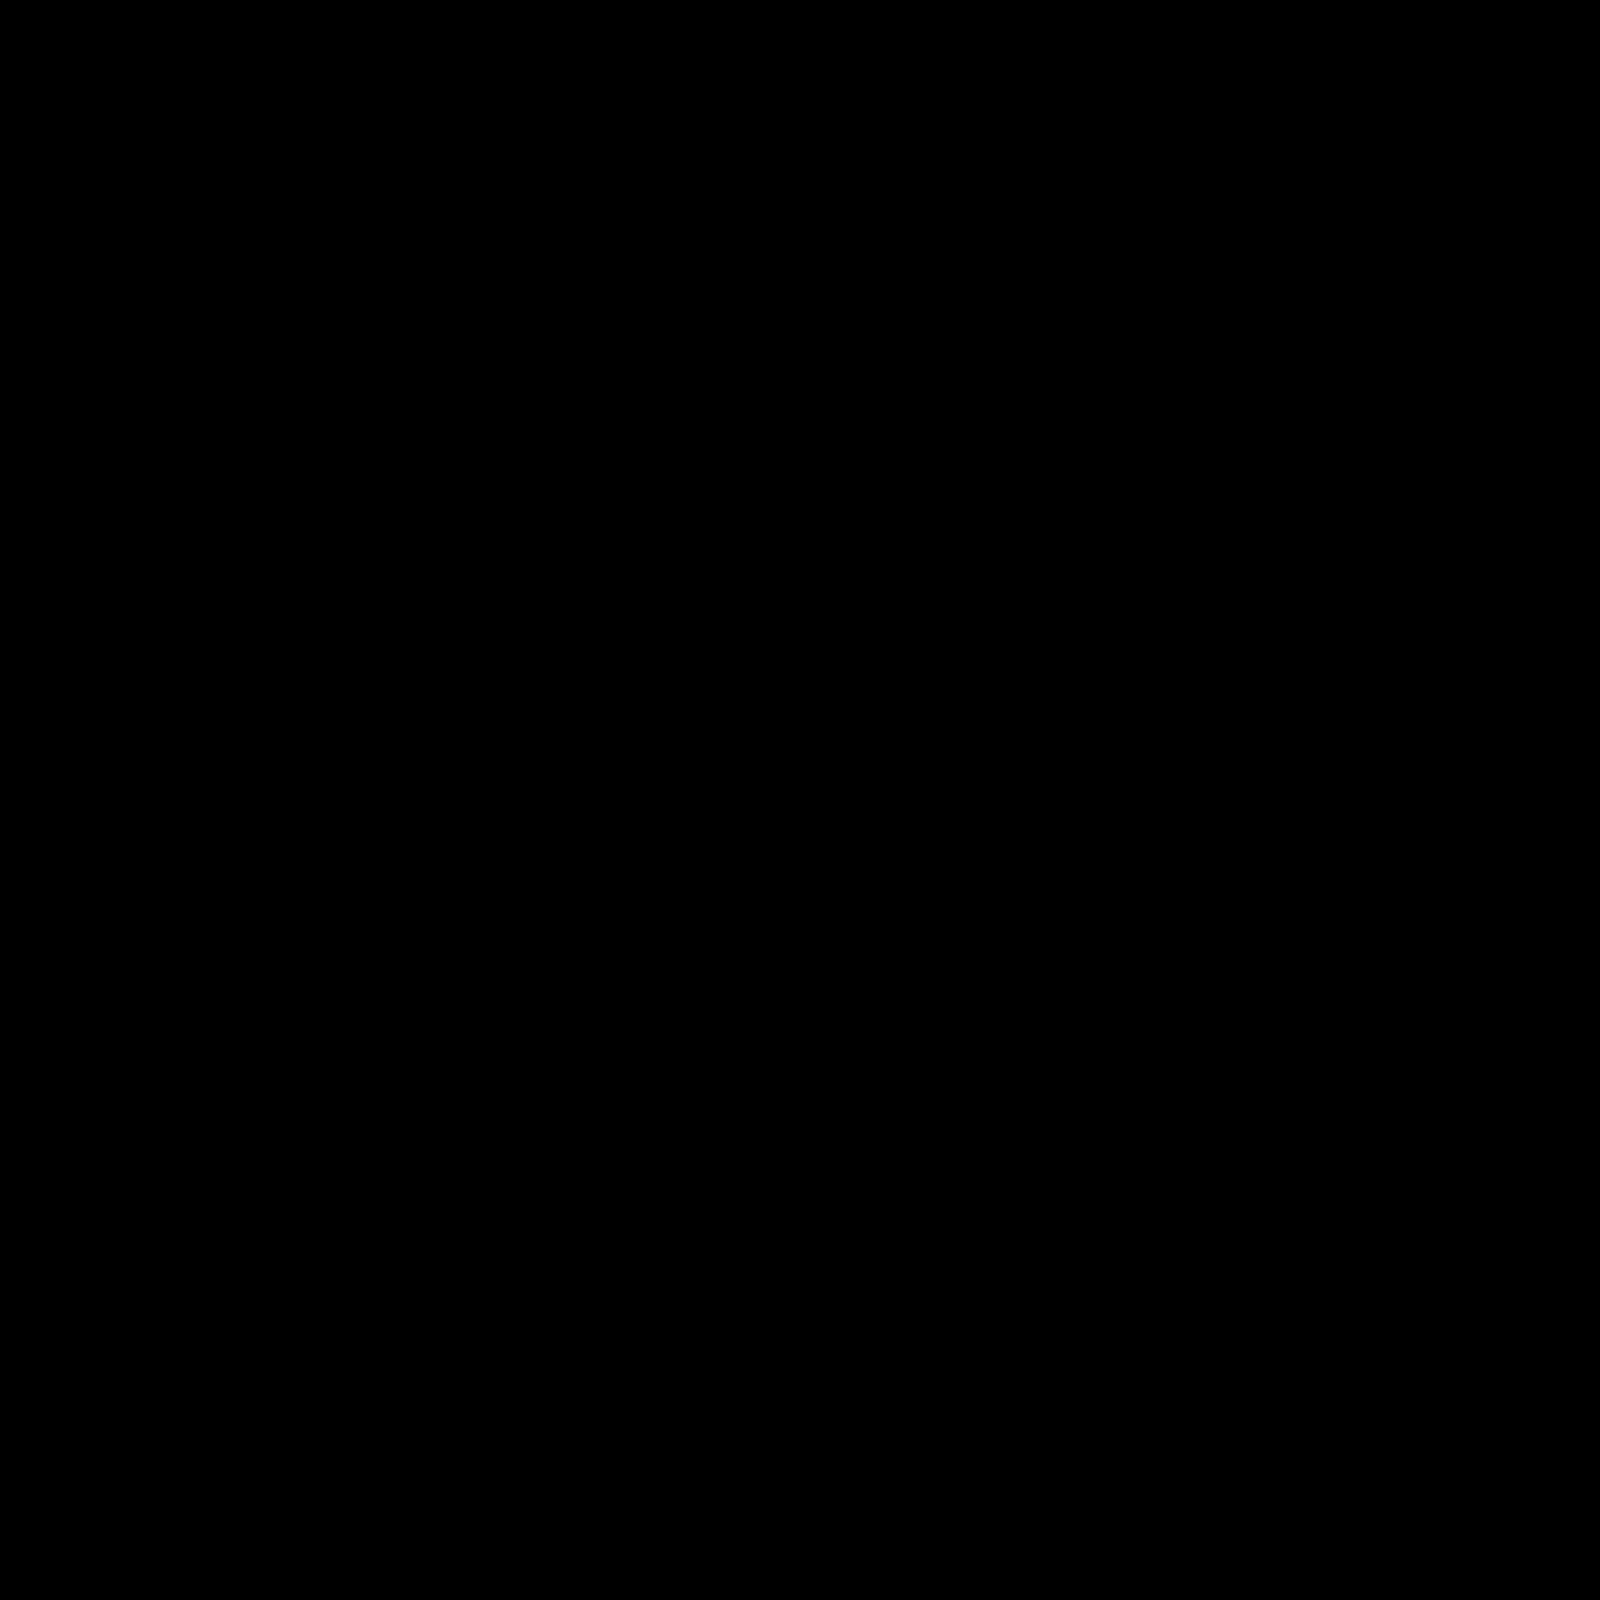 Guacamole Filled icon